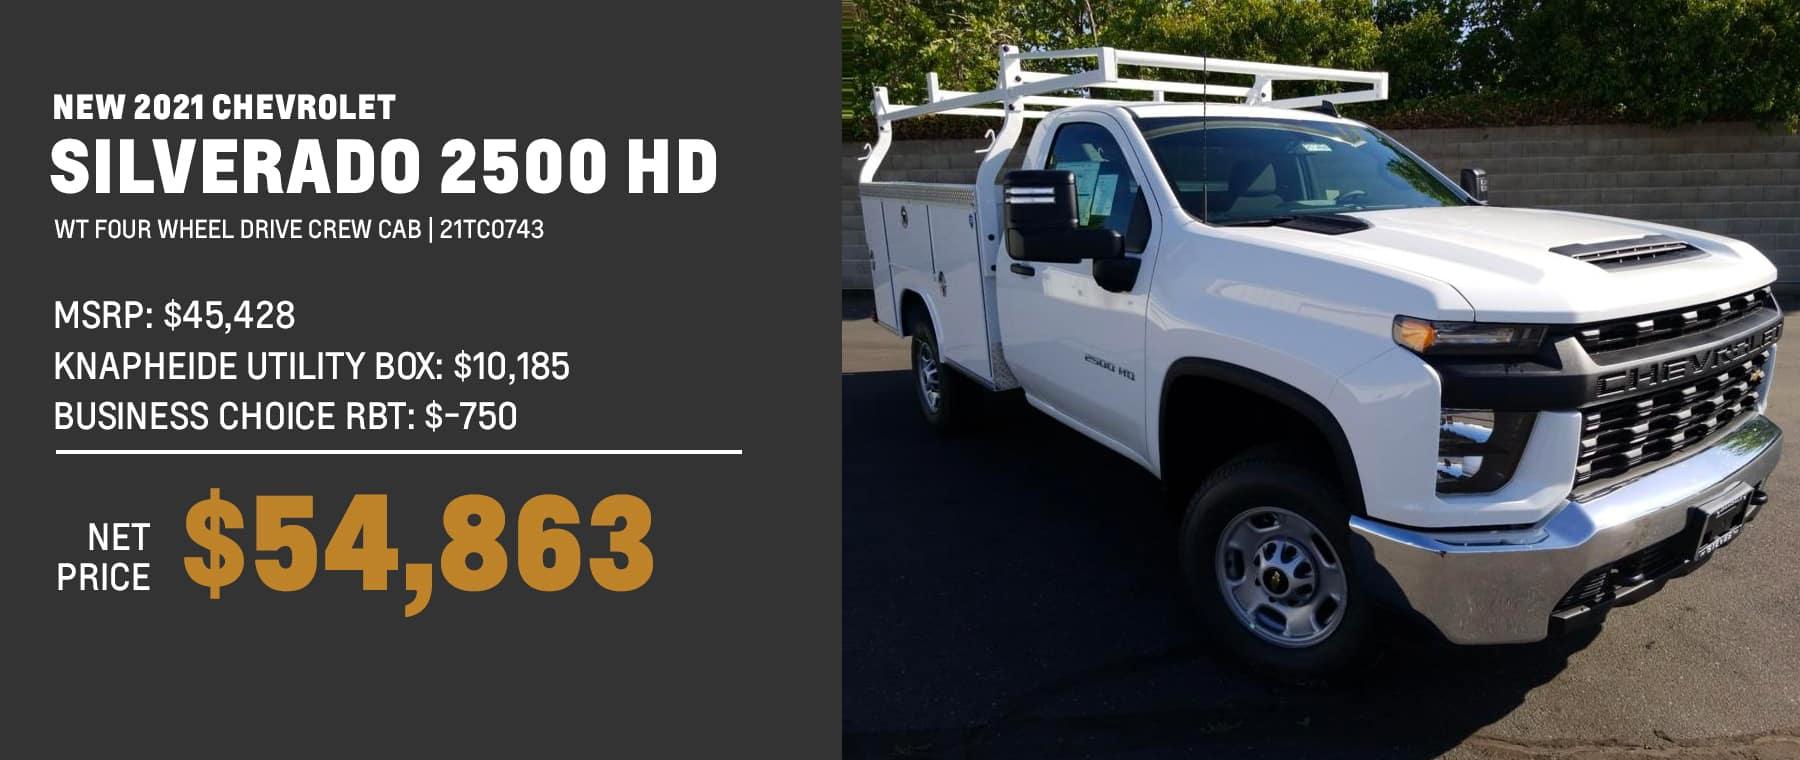 21TC0743 MSRP: $45,428 knapheide utility box: $10,185 business choice rbt: $-750 net price: $54,863